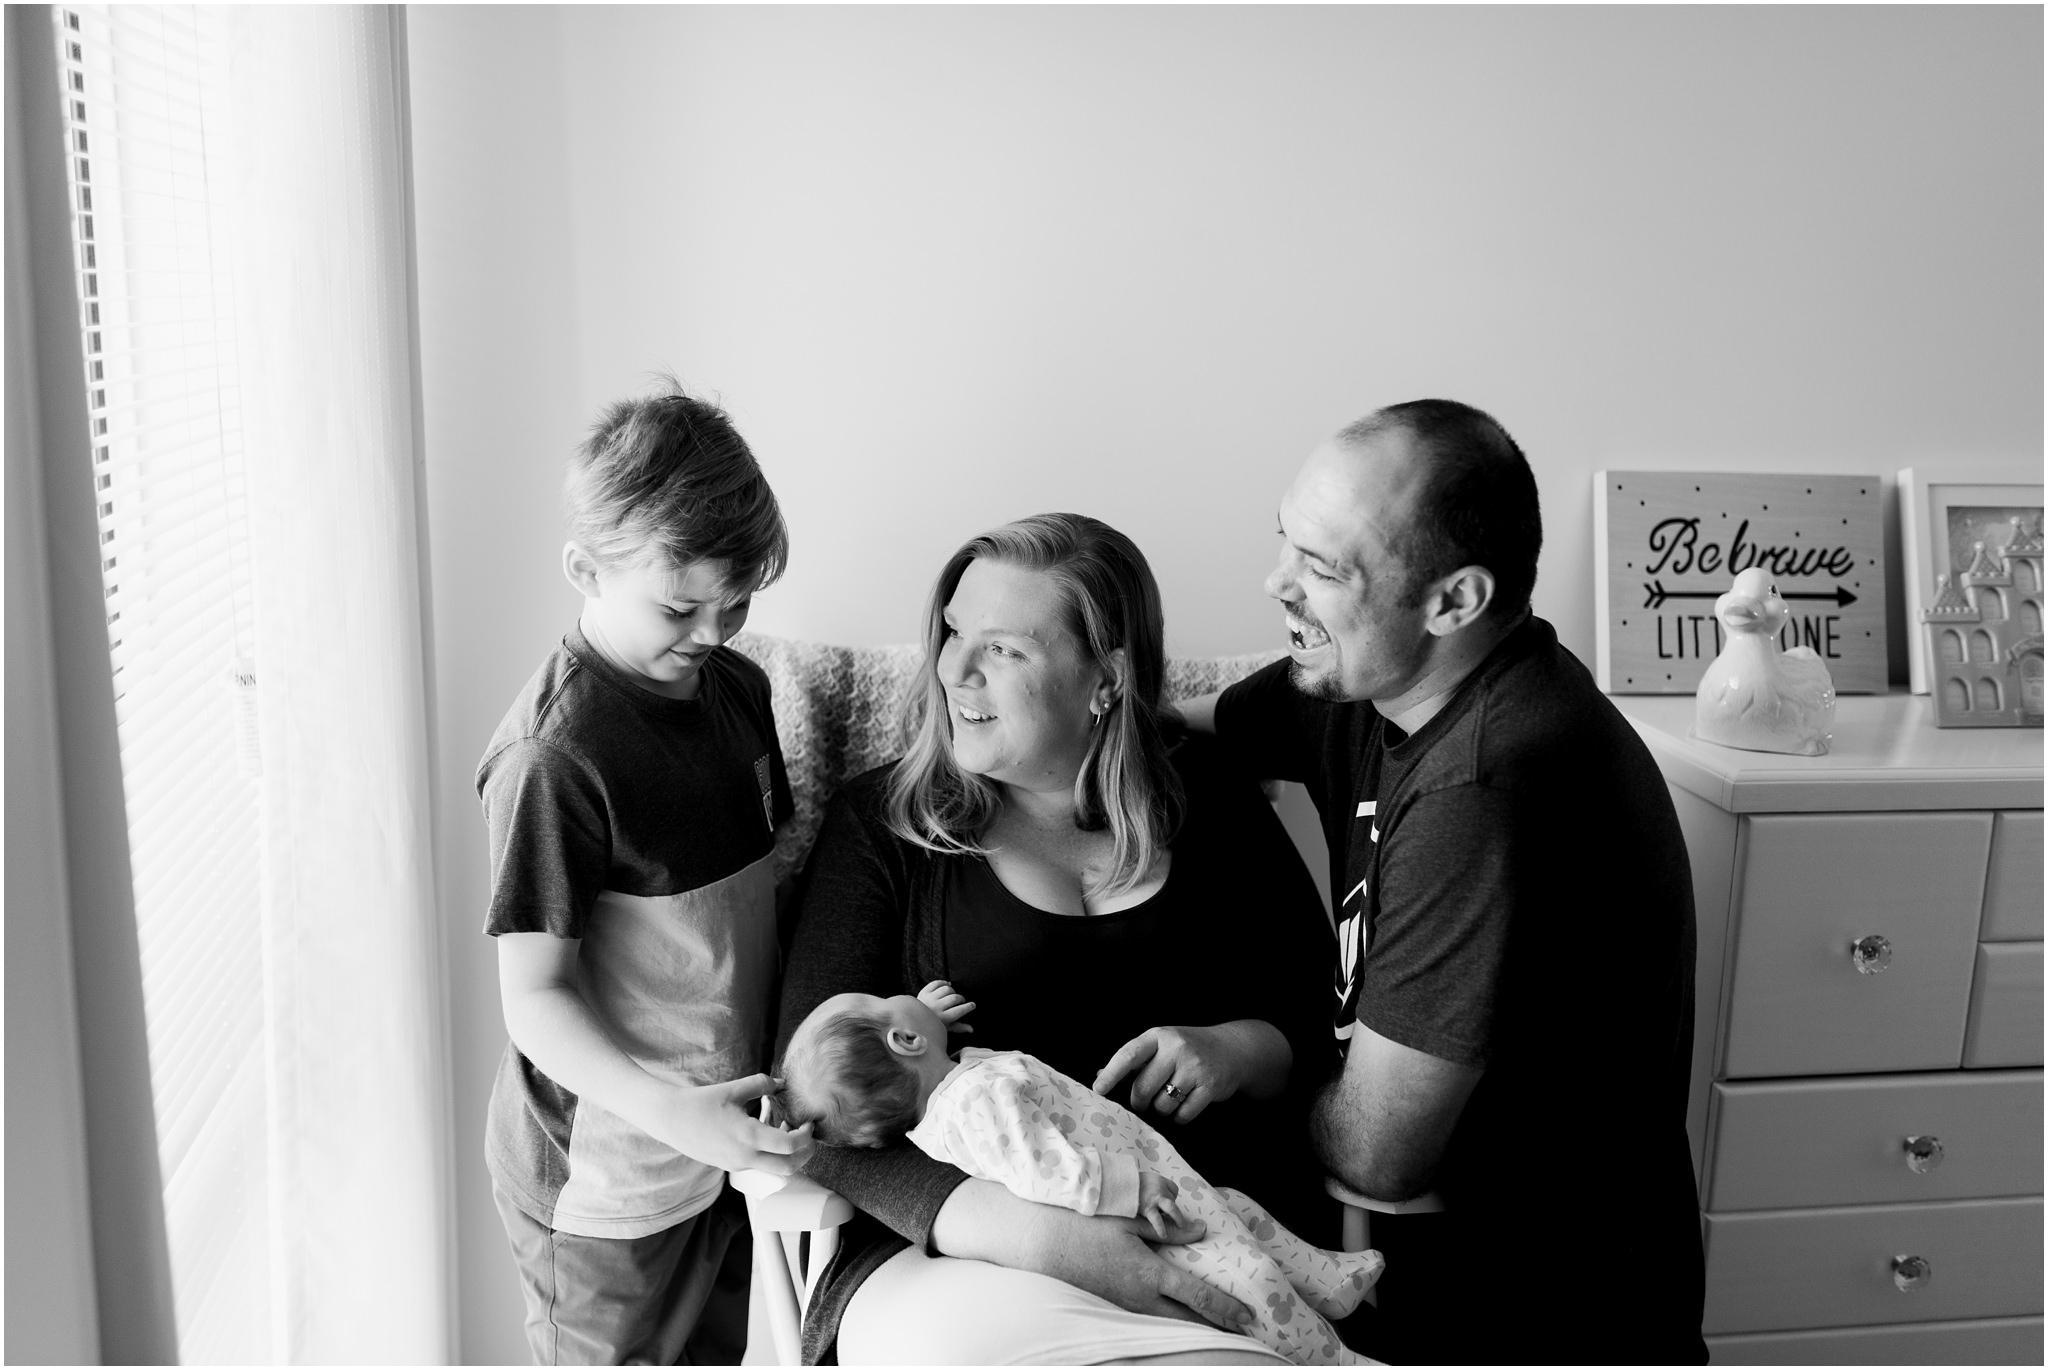 newborn-family-photography-lifestyle-home-baby6.jpg